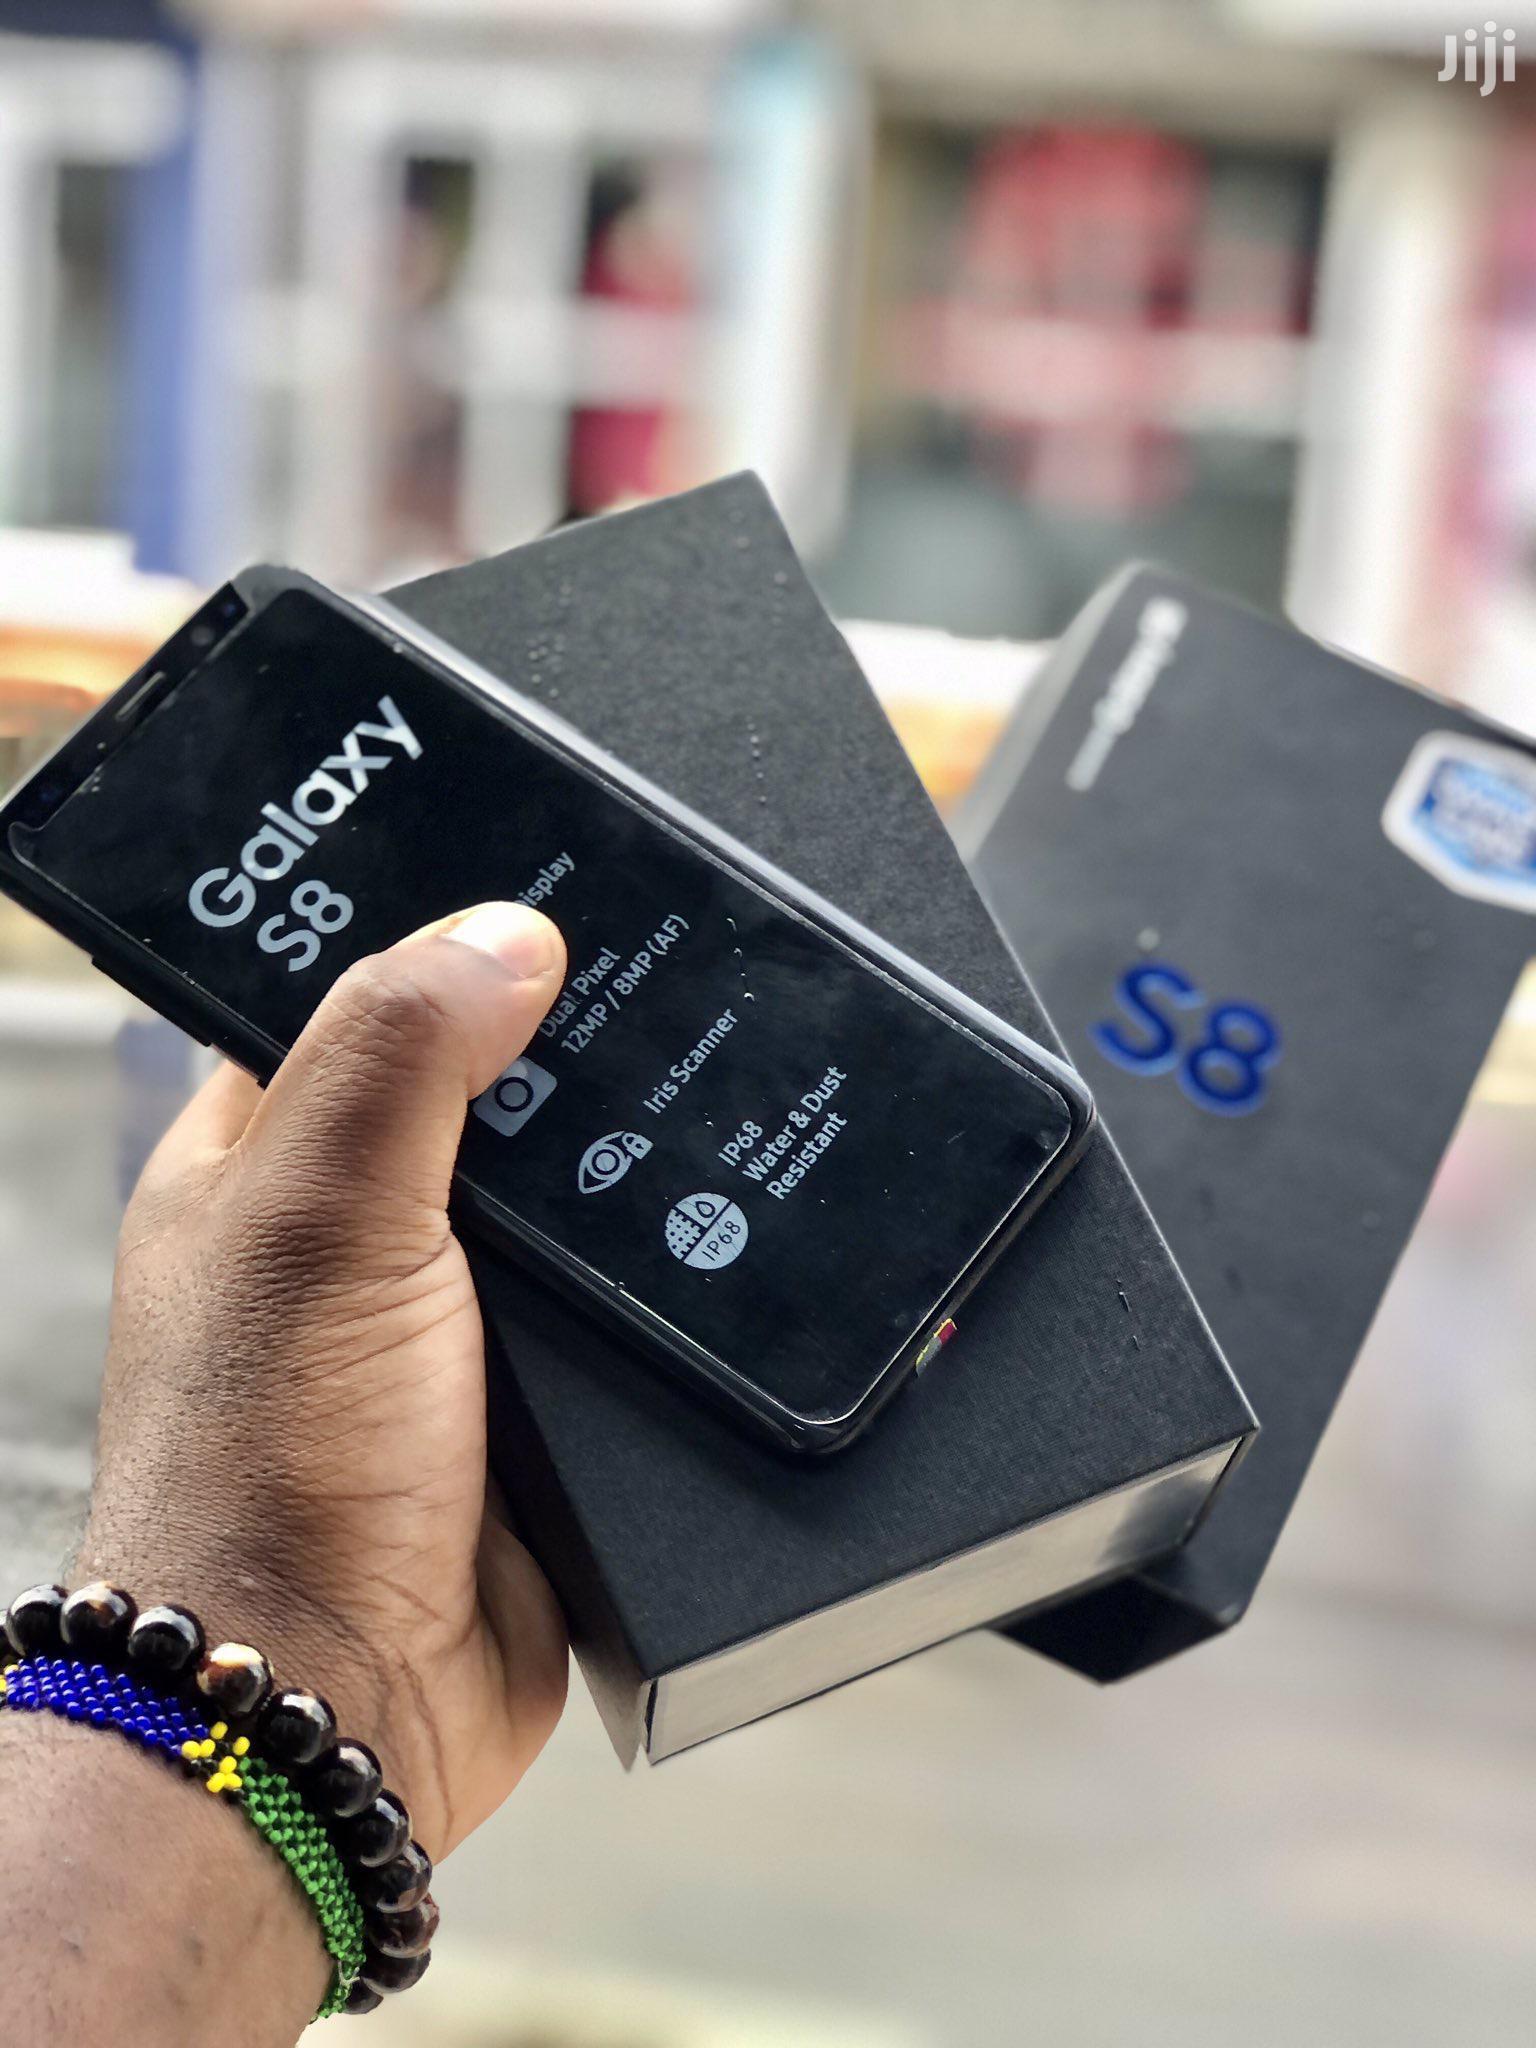 New Samsung Galaxy S8 64 GB | Mobile Phones for sale in Ilala, Dar es Salaam, Tanzania